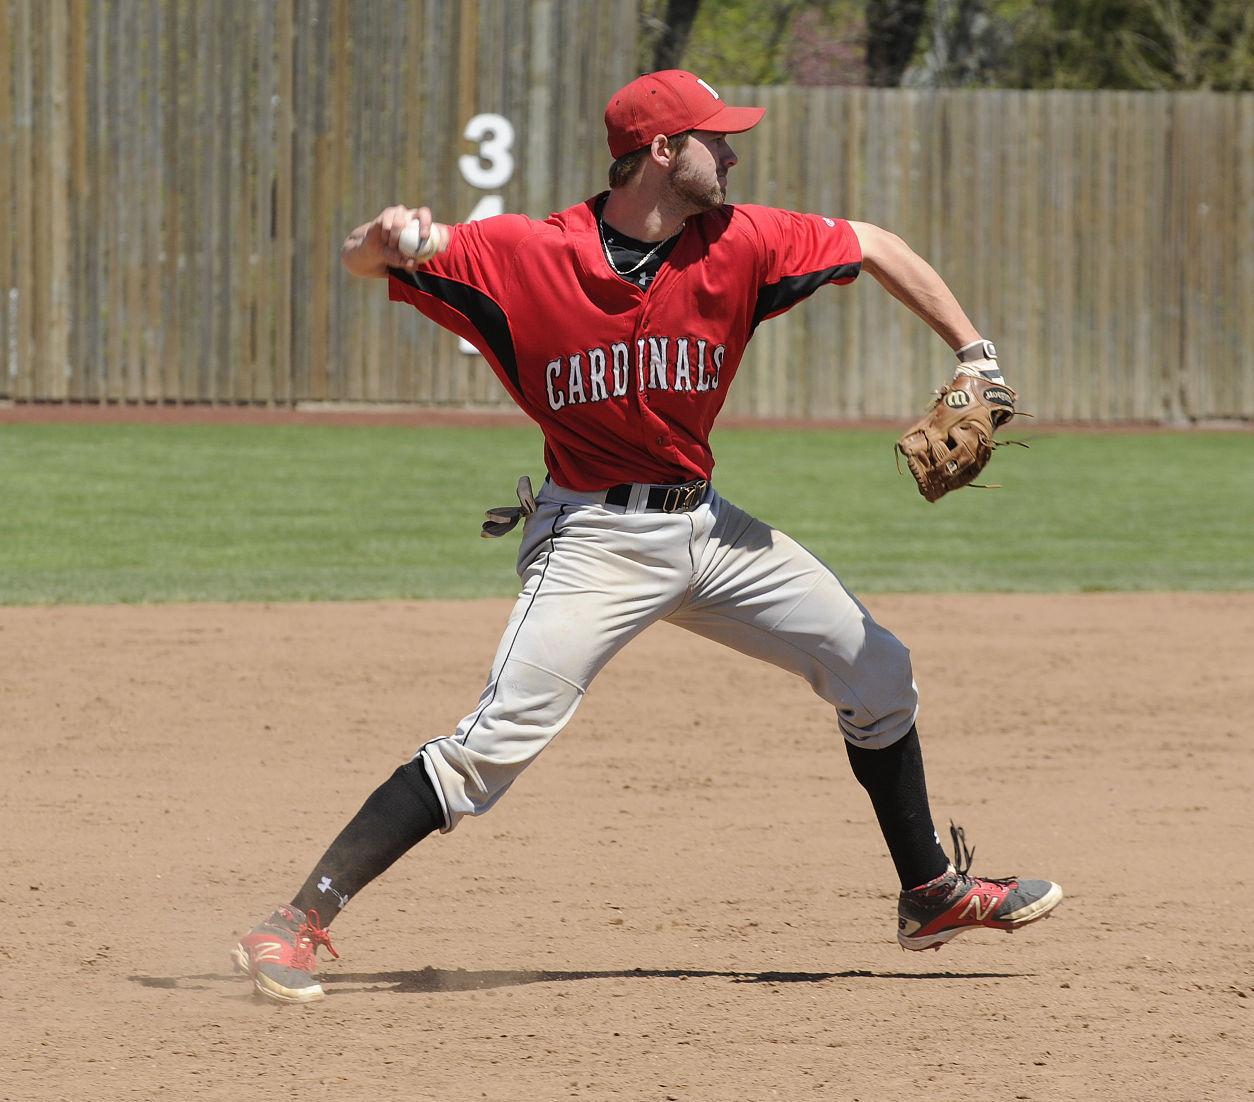 Muscatine cardinals baseball